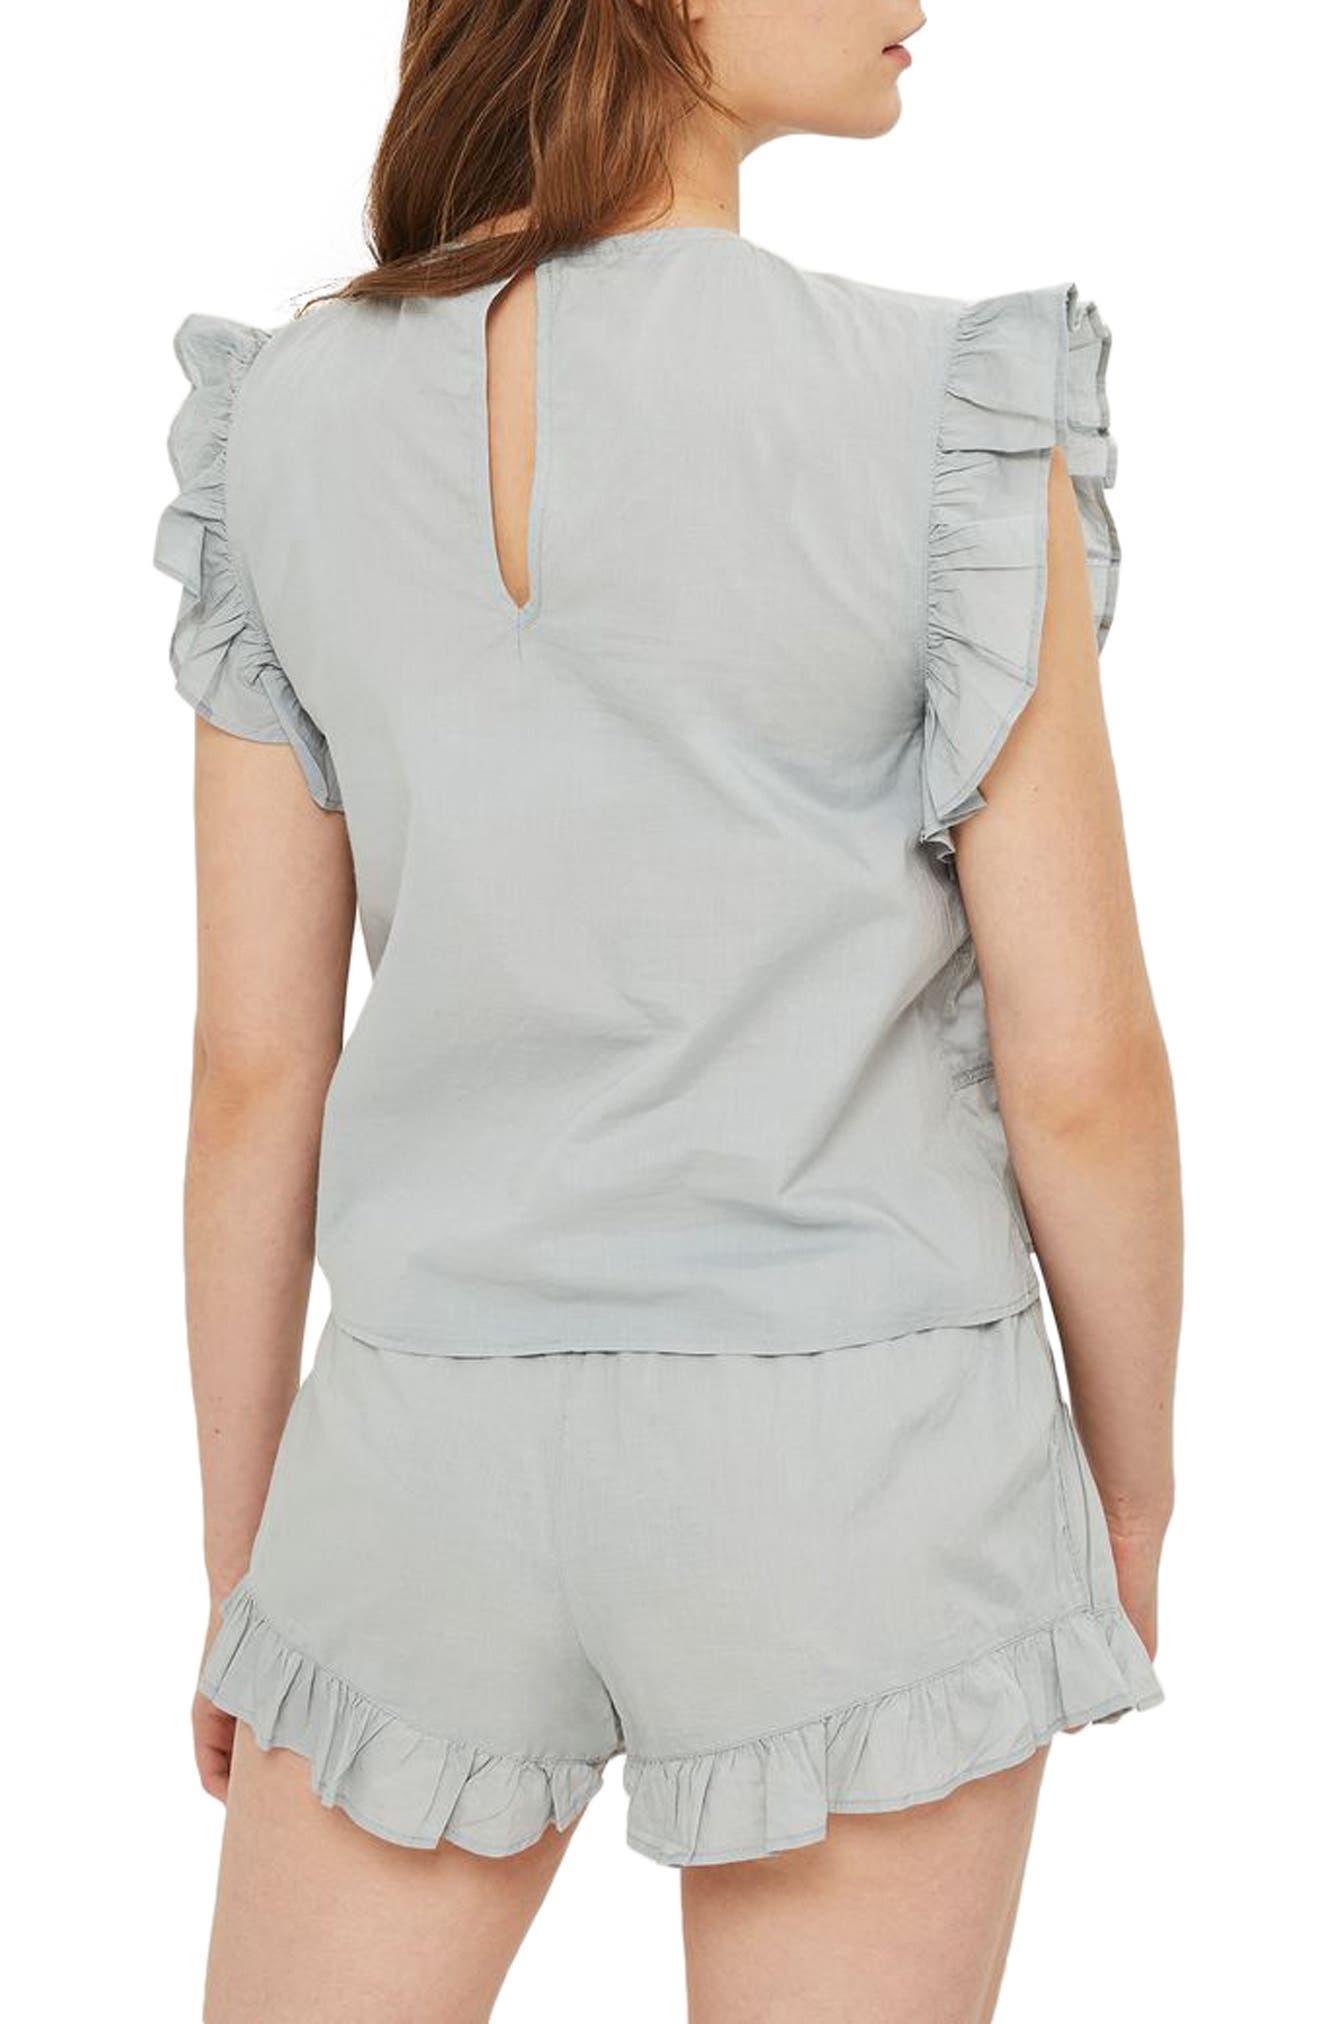 Bella Frilly Pajamas,                             Alternate thumbnail 2, color,                             020